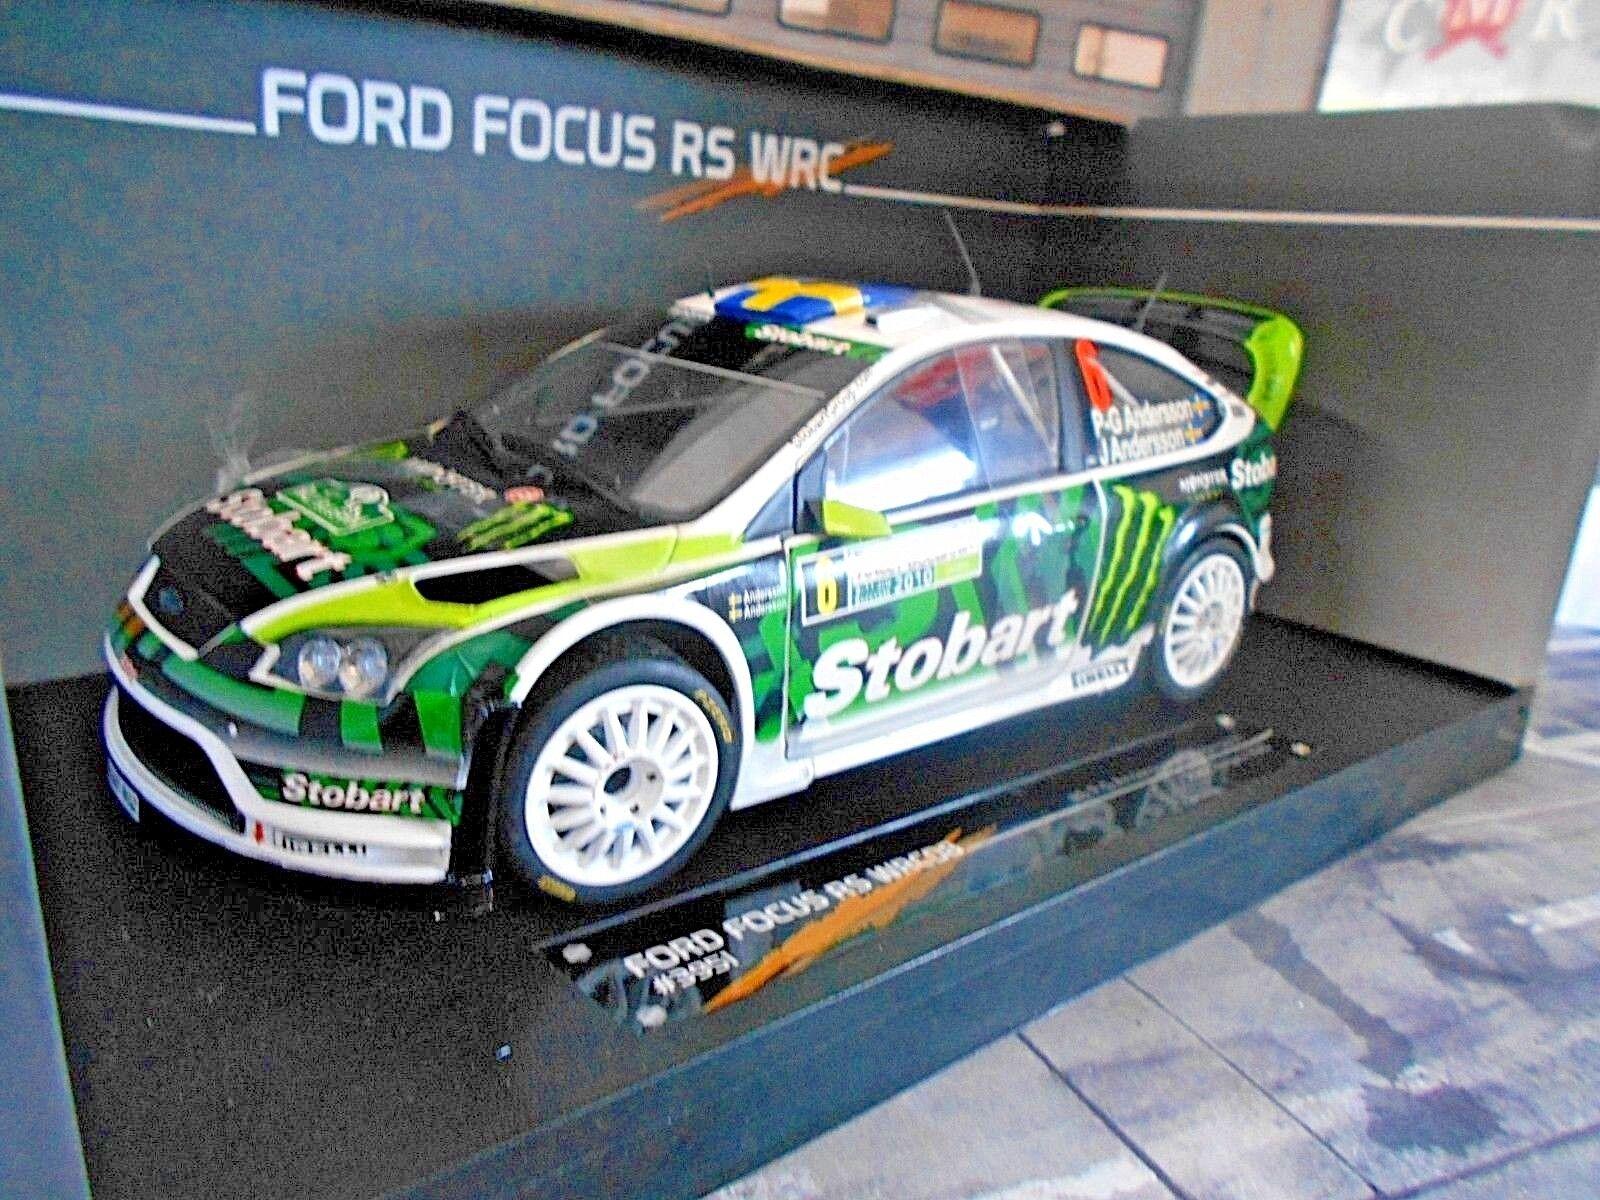 i nuovi marchi outlet online FORD Focus WRC RS RtuttiY BULGARIA 2010 2010 2010  6 PG eersson Stobart S SUNestrella 1 18  vendite online